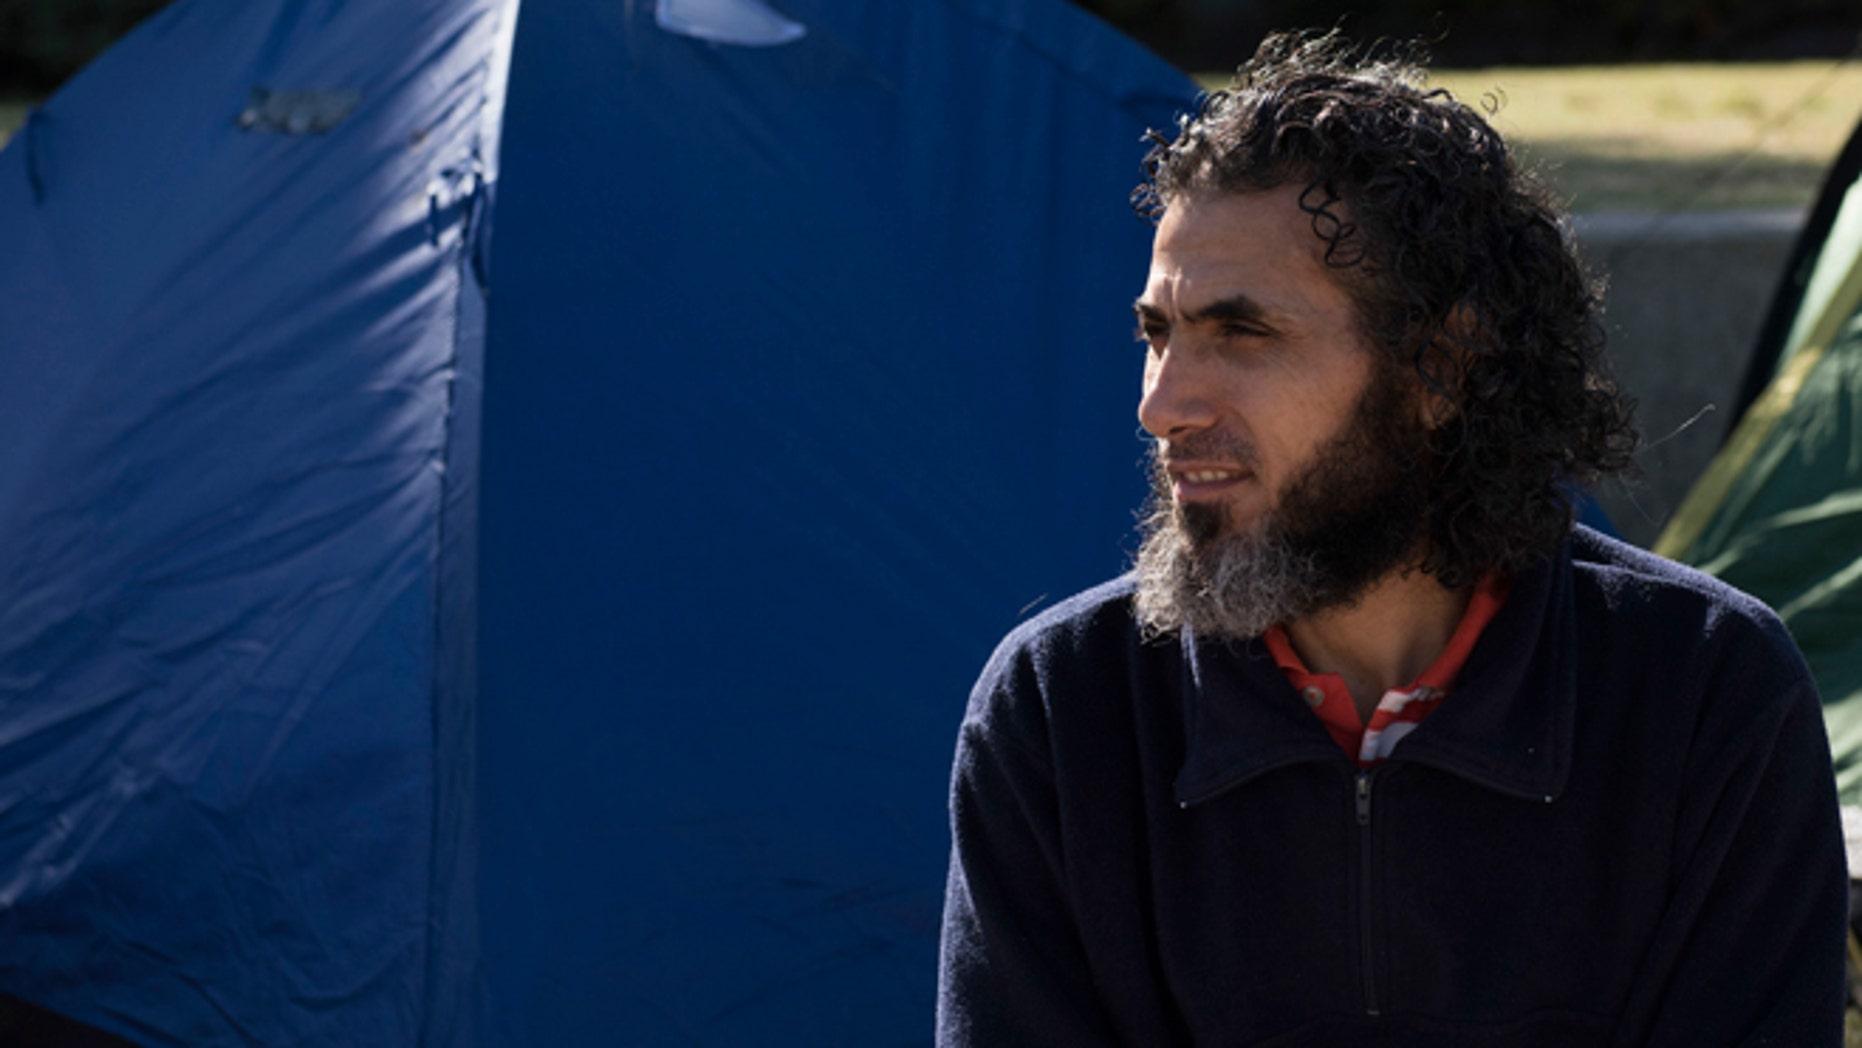 Former Guantanamo detainee Abu Wa'el Dhiab in a May 5, 2015 photo.